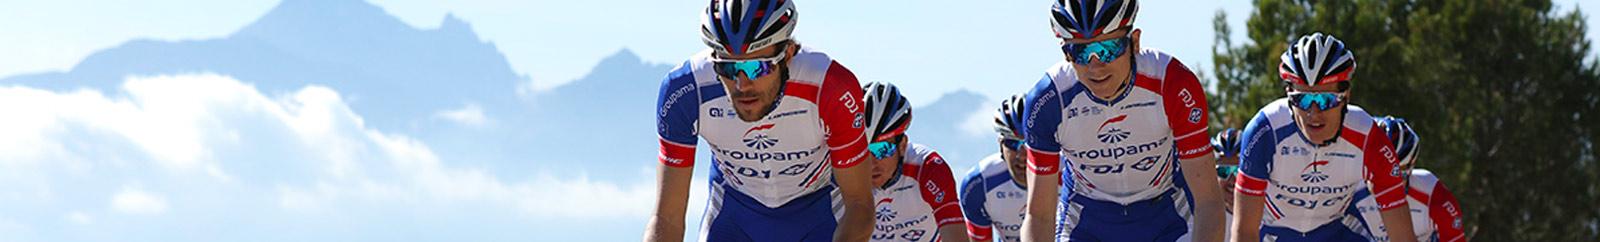 Equipe cycliste Groupama